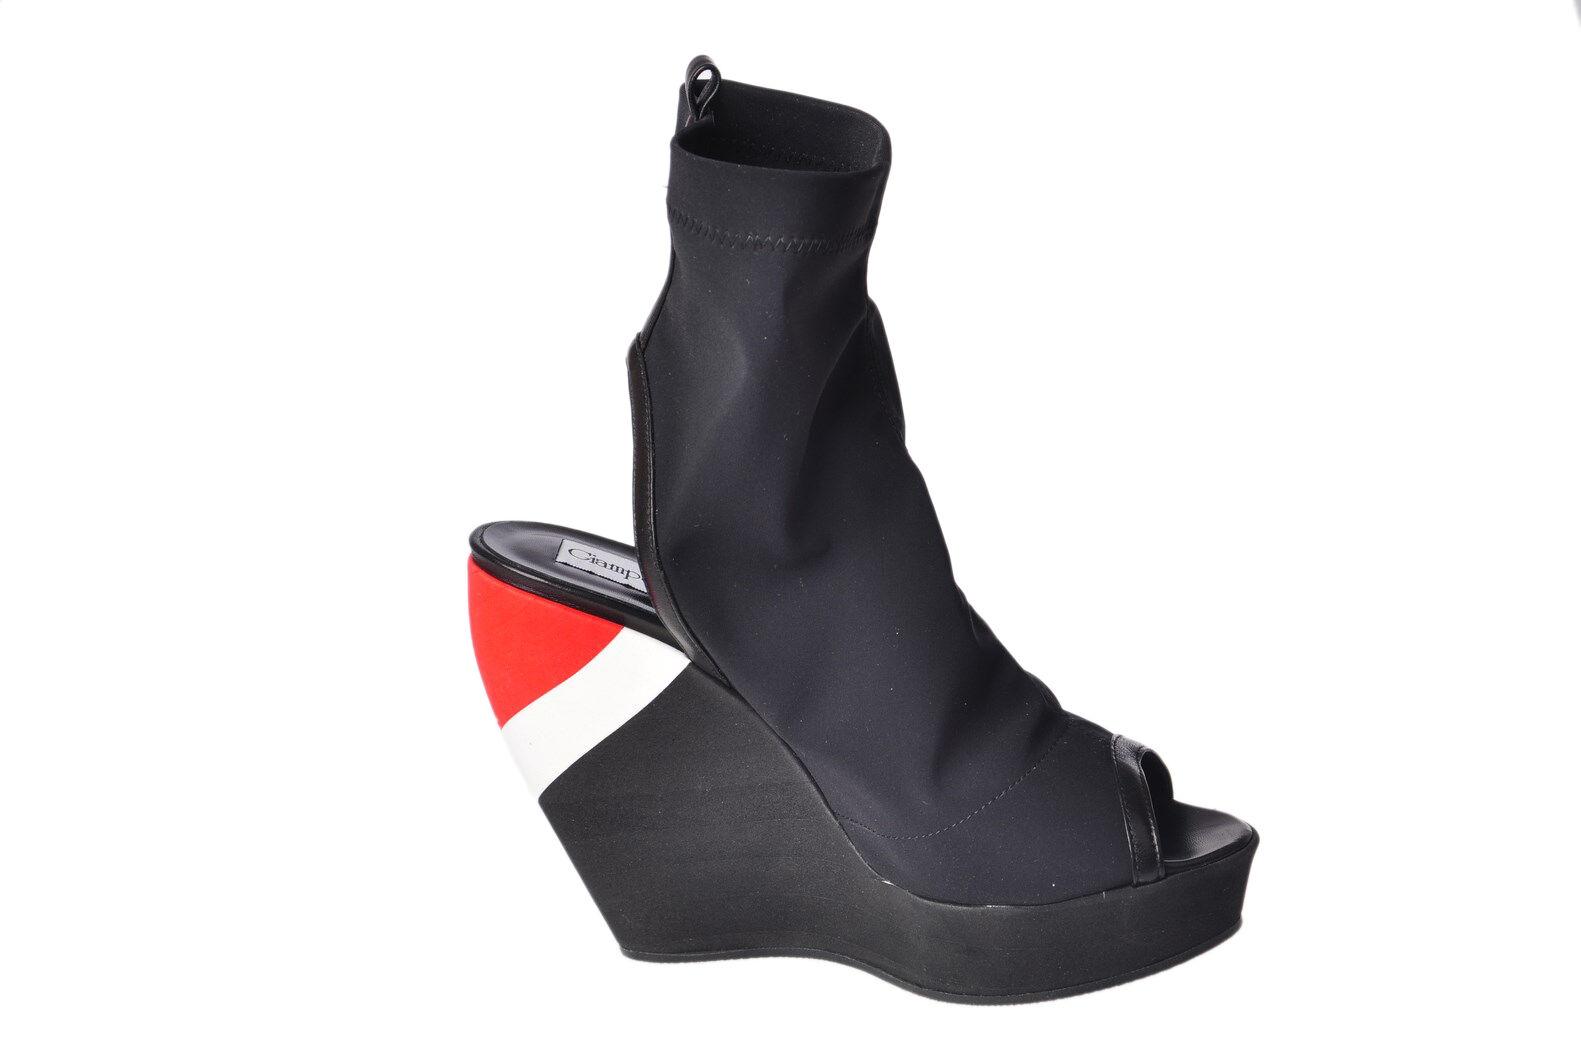 Le Viozzi    Viozzi Shoes female Nero 306327A185053 a85799